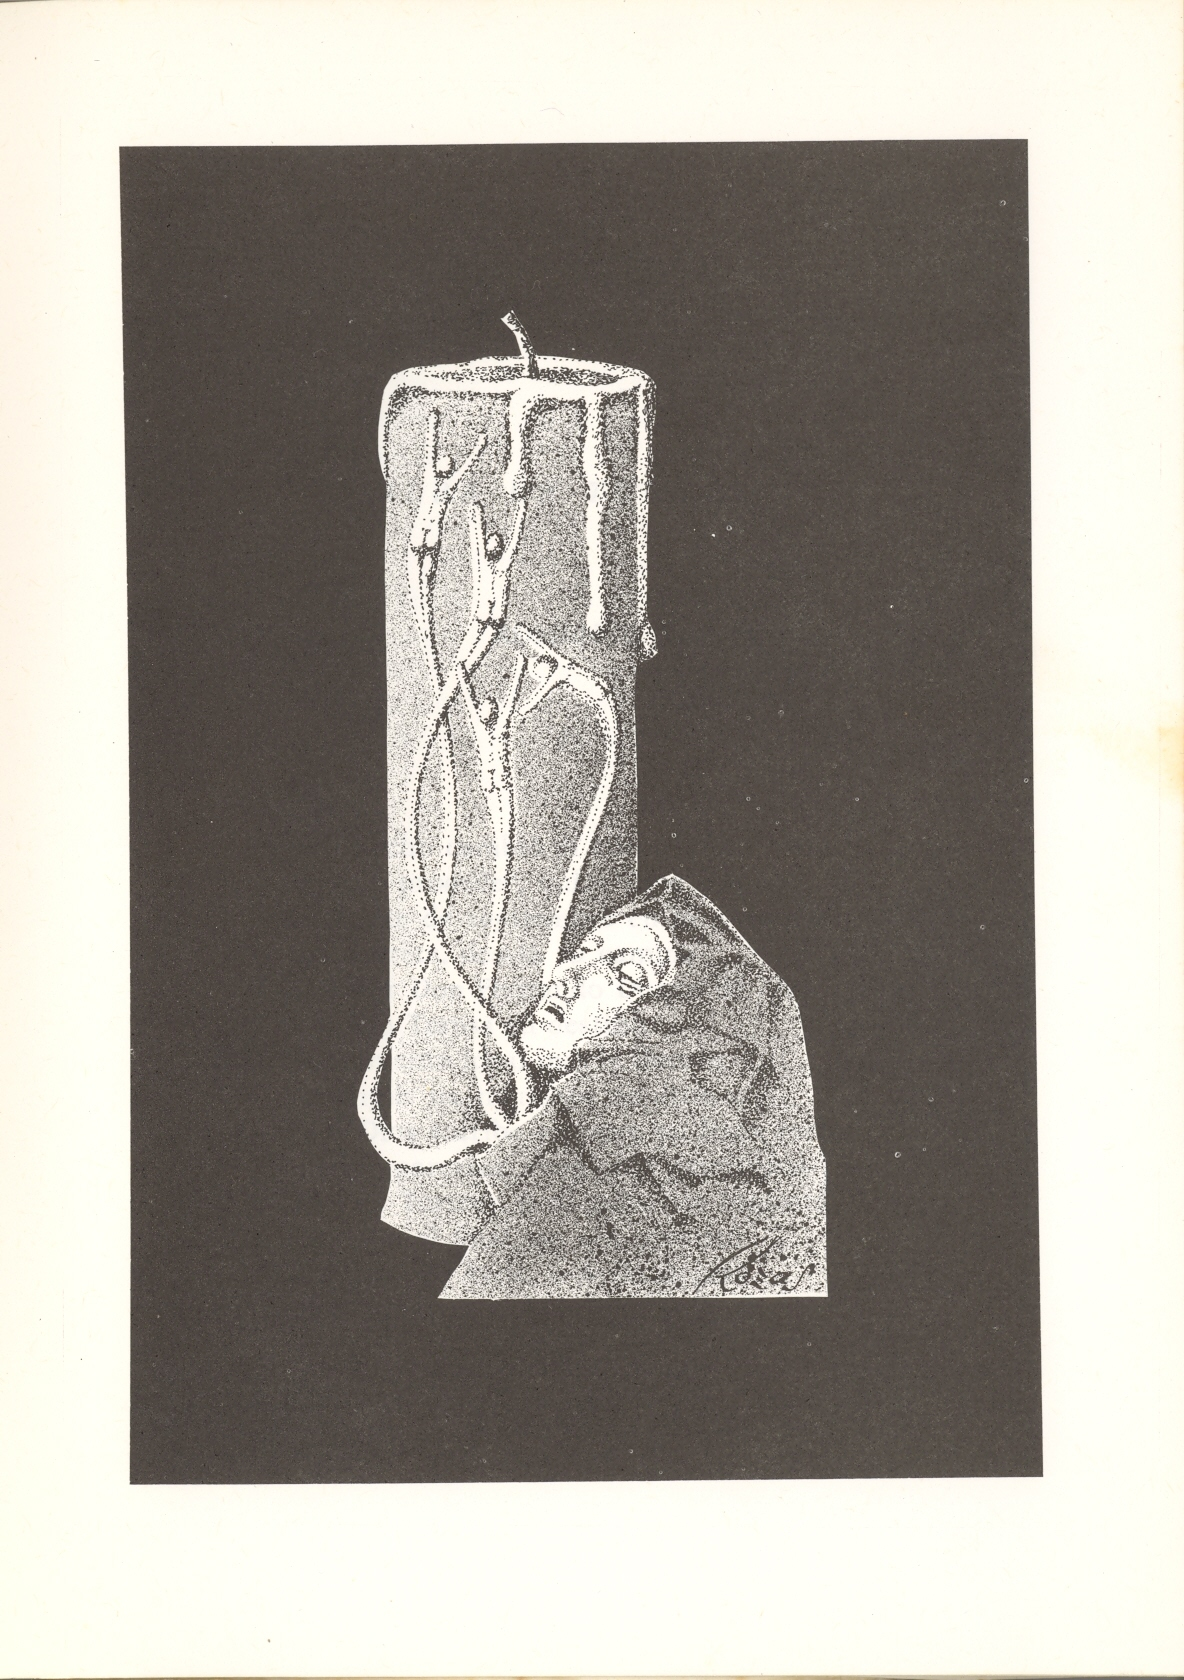 1983 Las moradas 6